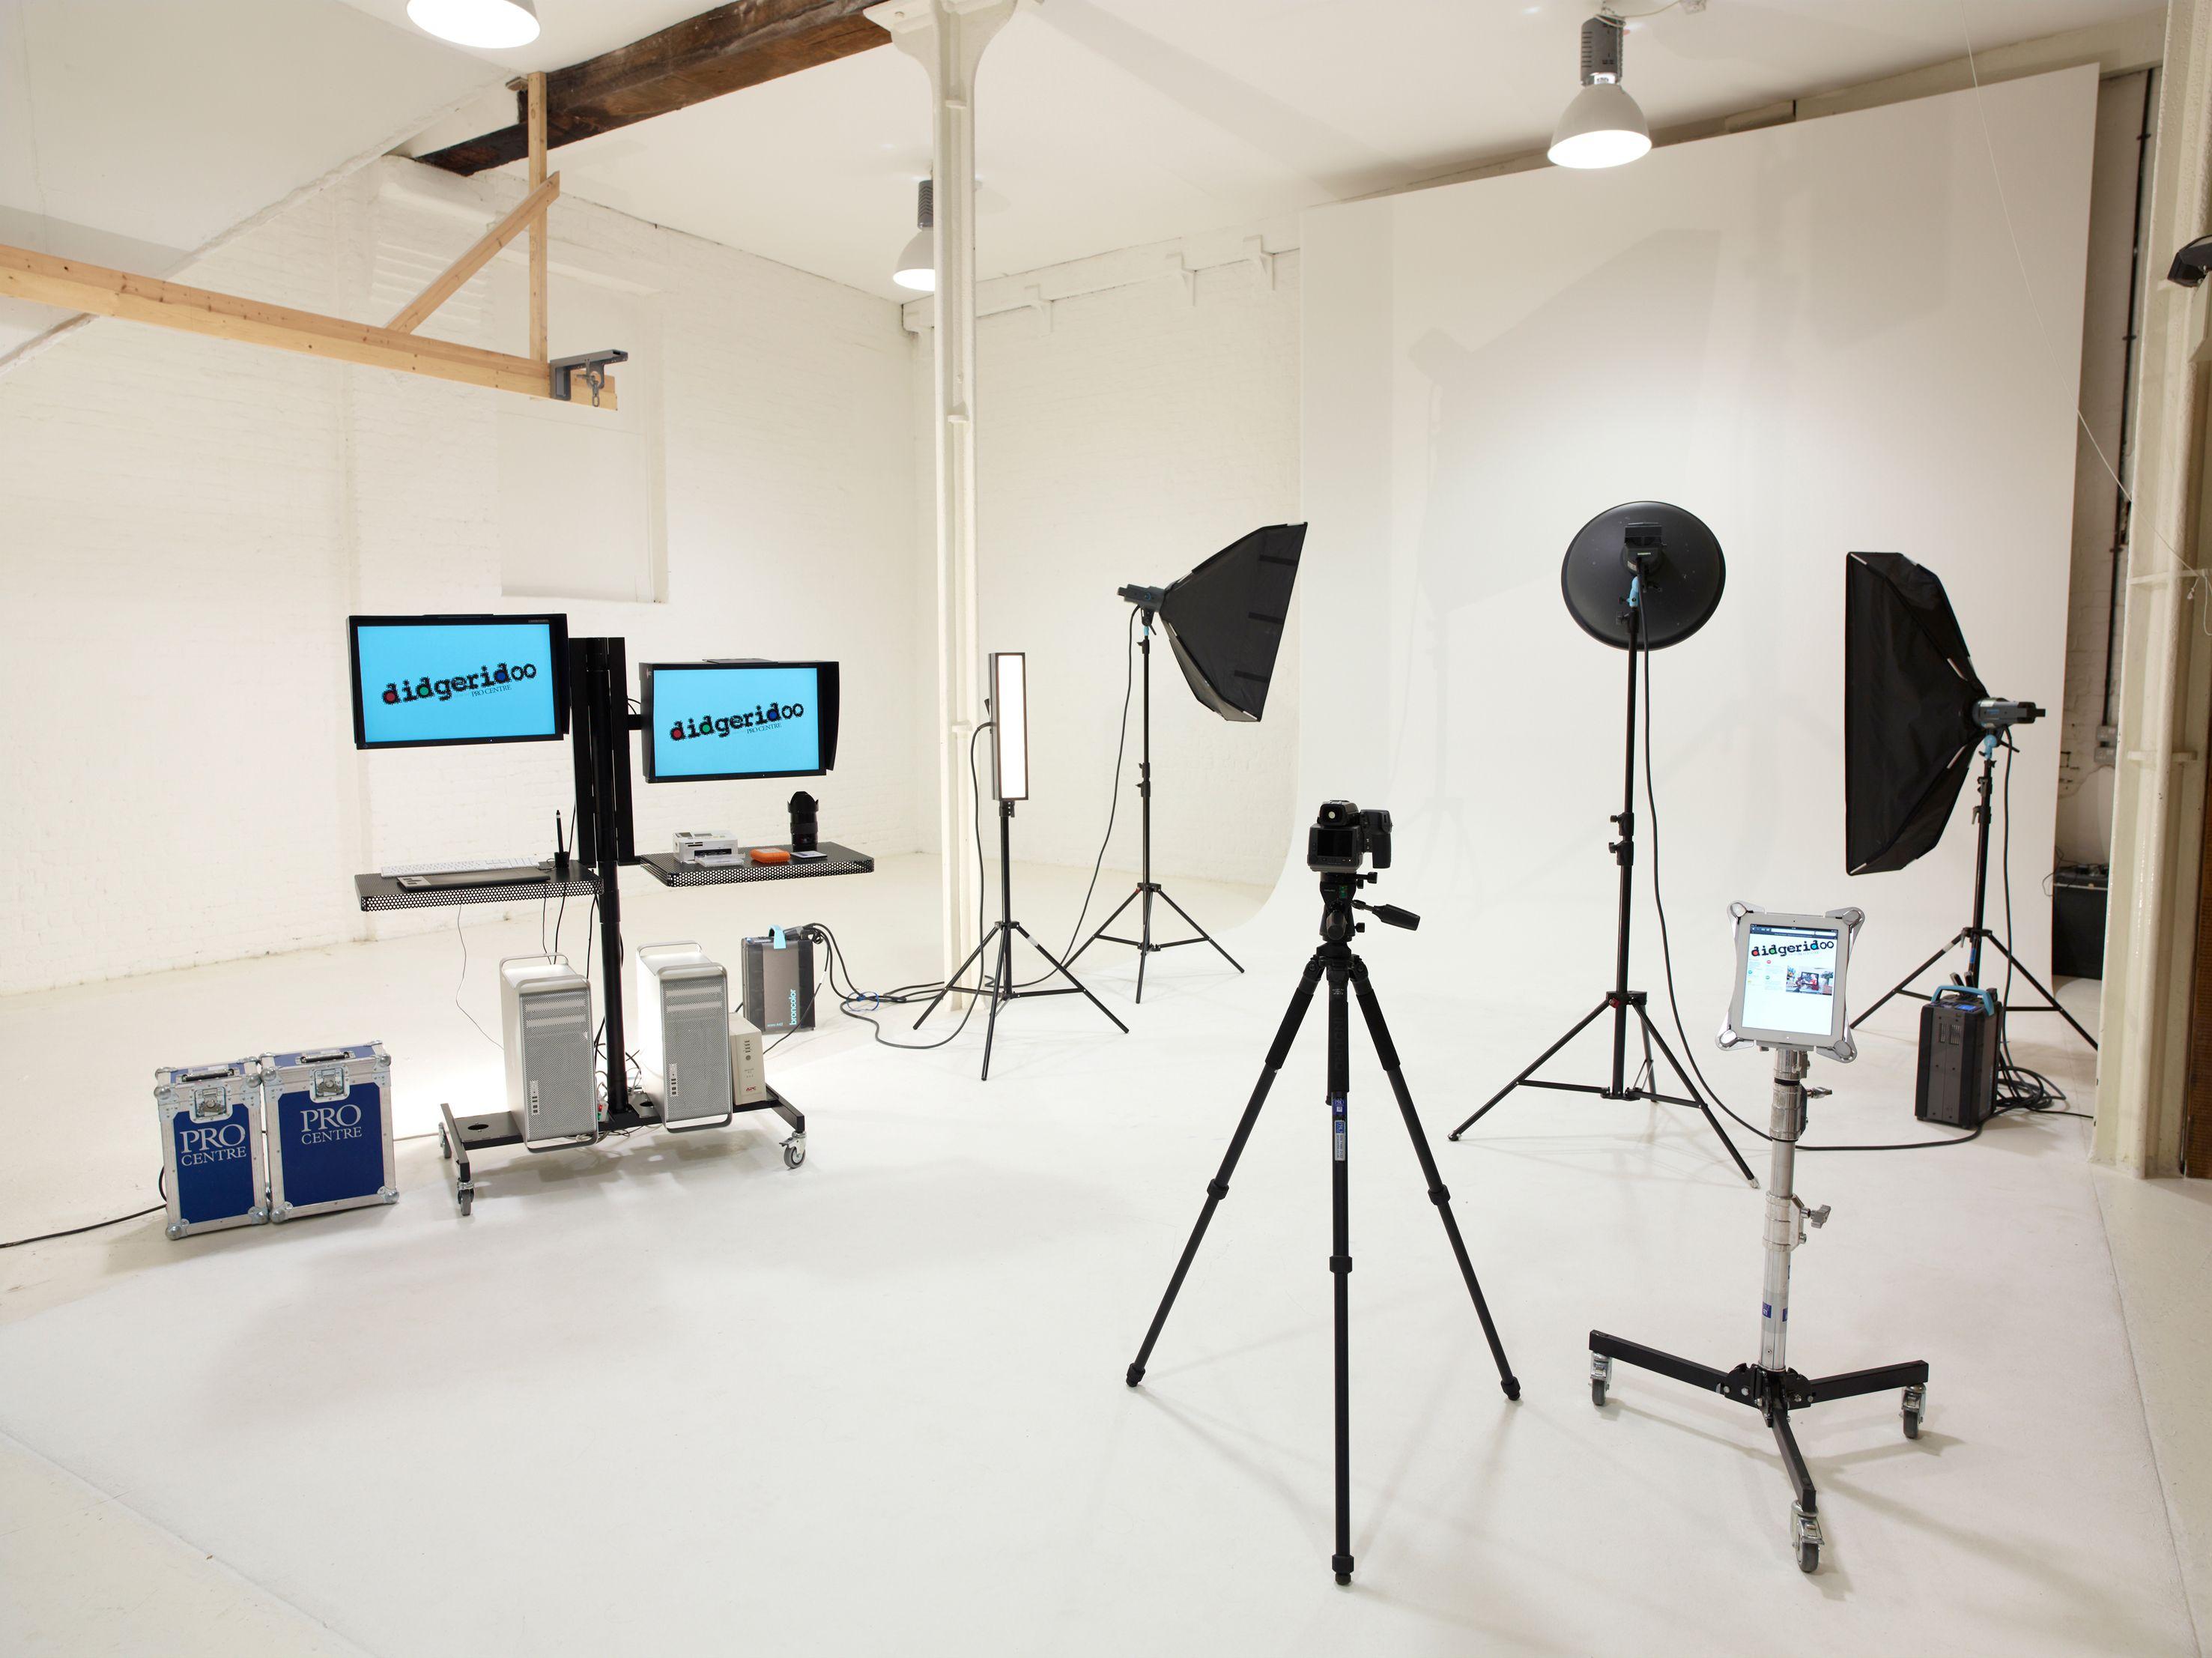 Photography Studio Design Google Search Computer Stands Photography Studio Setup Photography Studio Equipment Photography Studio Design